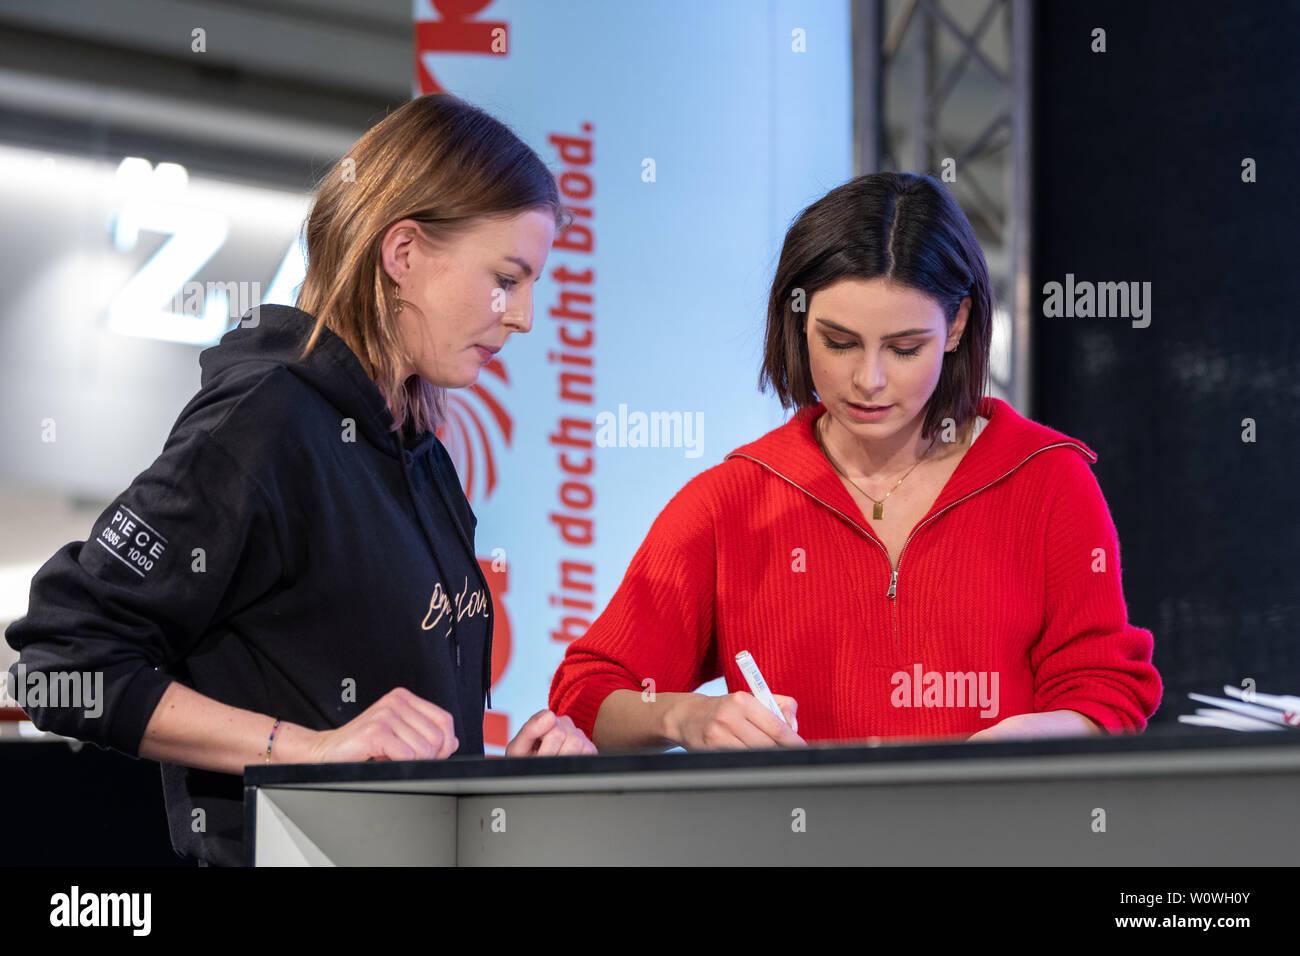 "Lena Meyer-Landrut Autogrammstunde mit zu Ihrem Albumstart ""seulement l'amour, l""'im ALEXA Berlin / 090419 Banque D'Images"